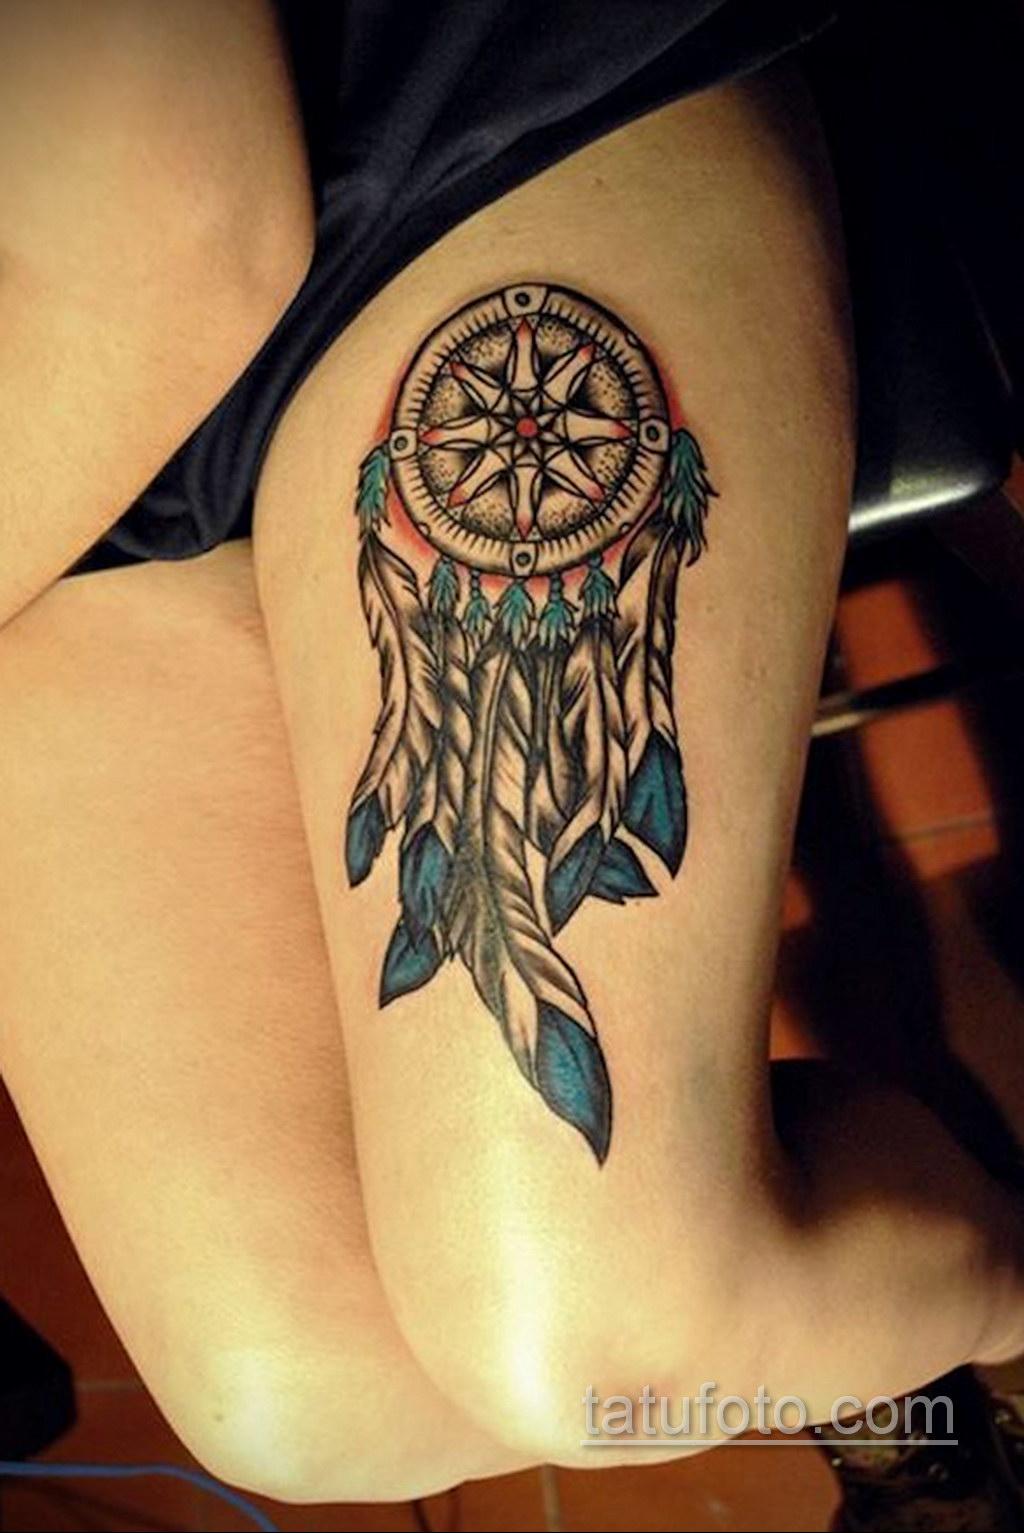 Фото рисунка тату с ловцом снов 22.11.2020 №631 -Dreamcatcher tattoo- tatufoto.com